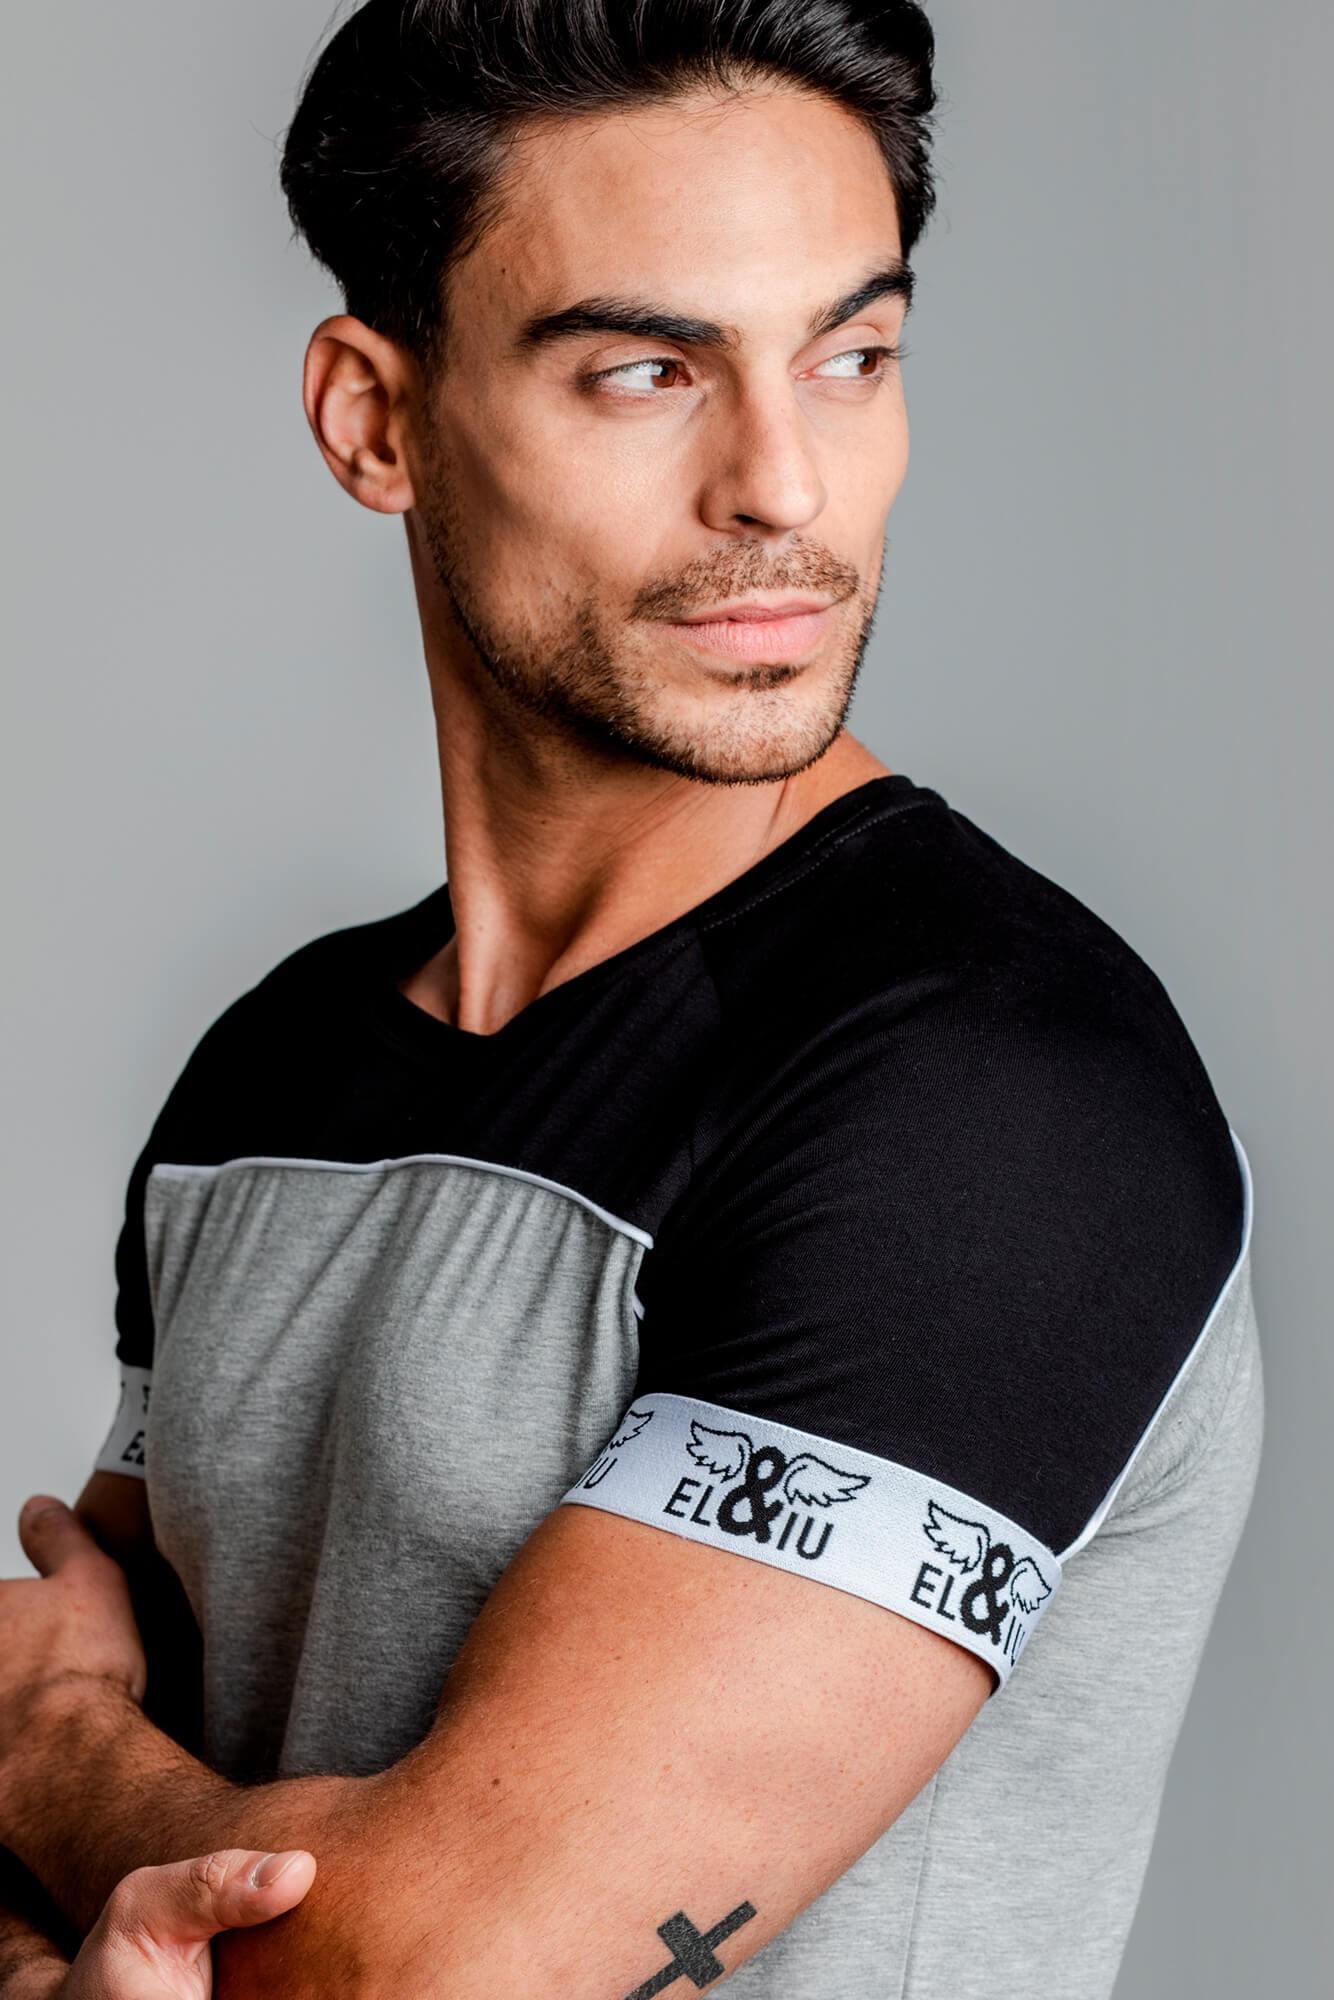 Camiseta Elastic Logo slim fit, 100% algodón. Estilo urbano de la marca ELIU streetwear.